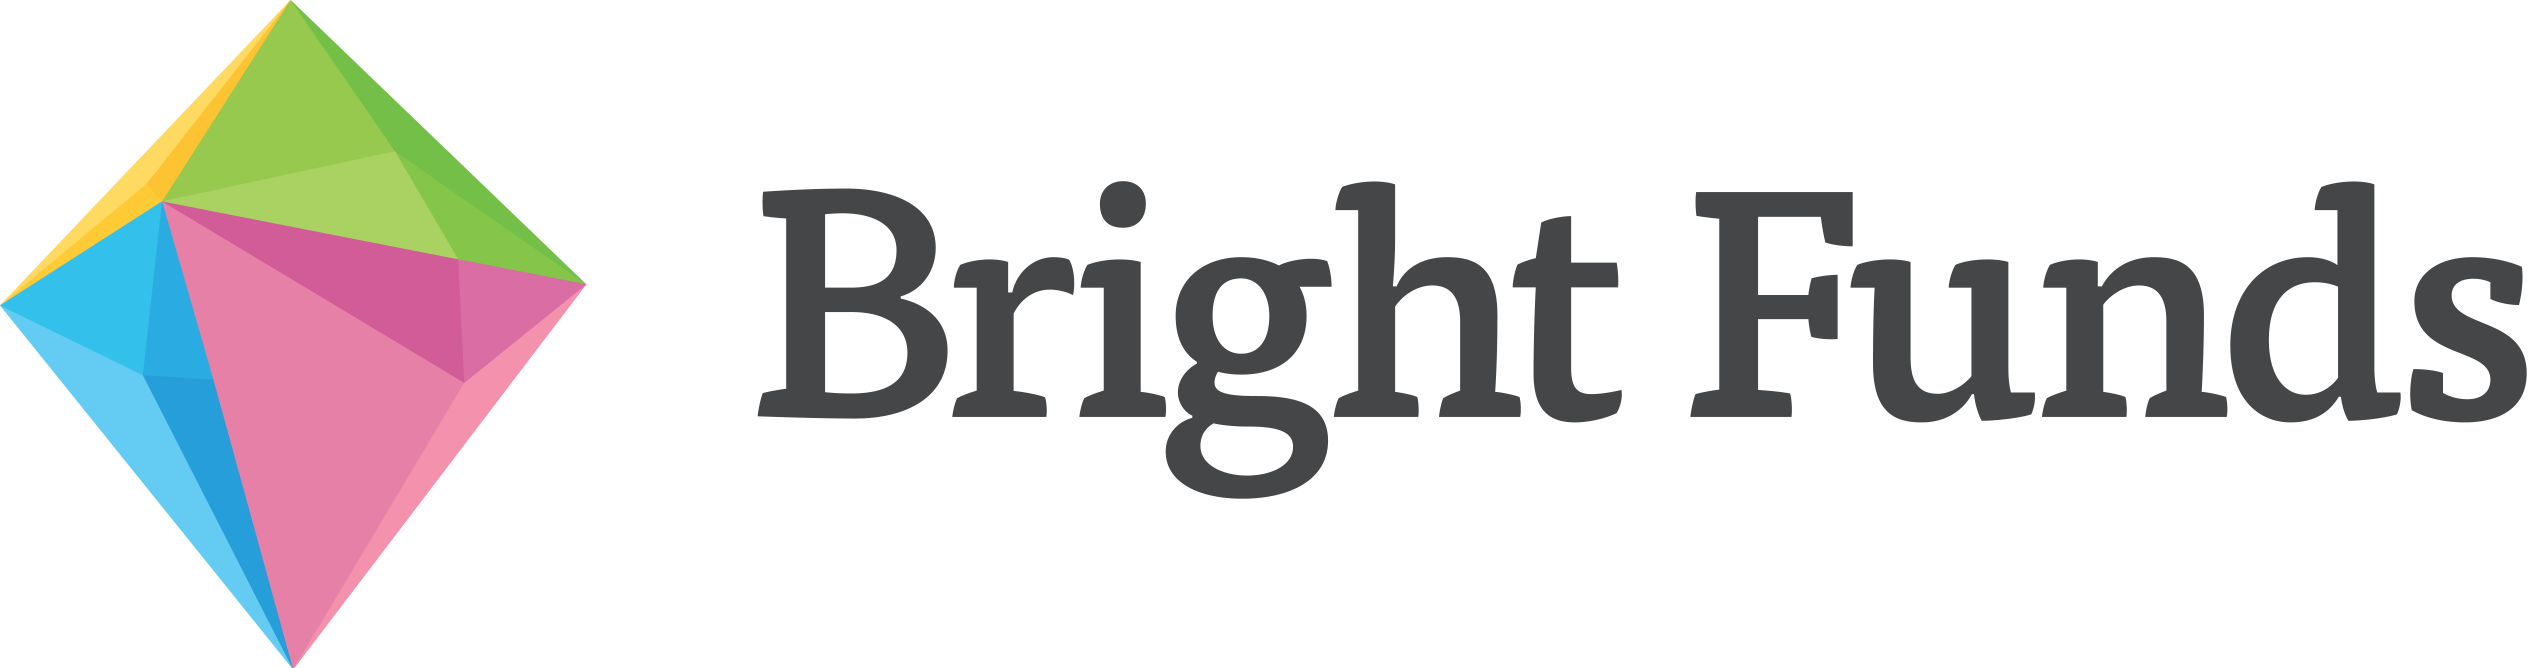 brightfunds-logo.png